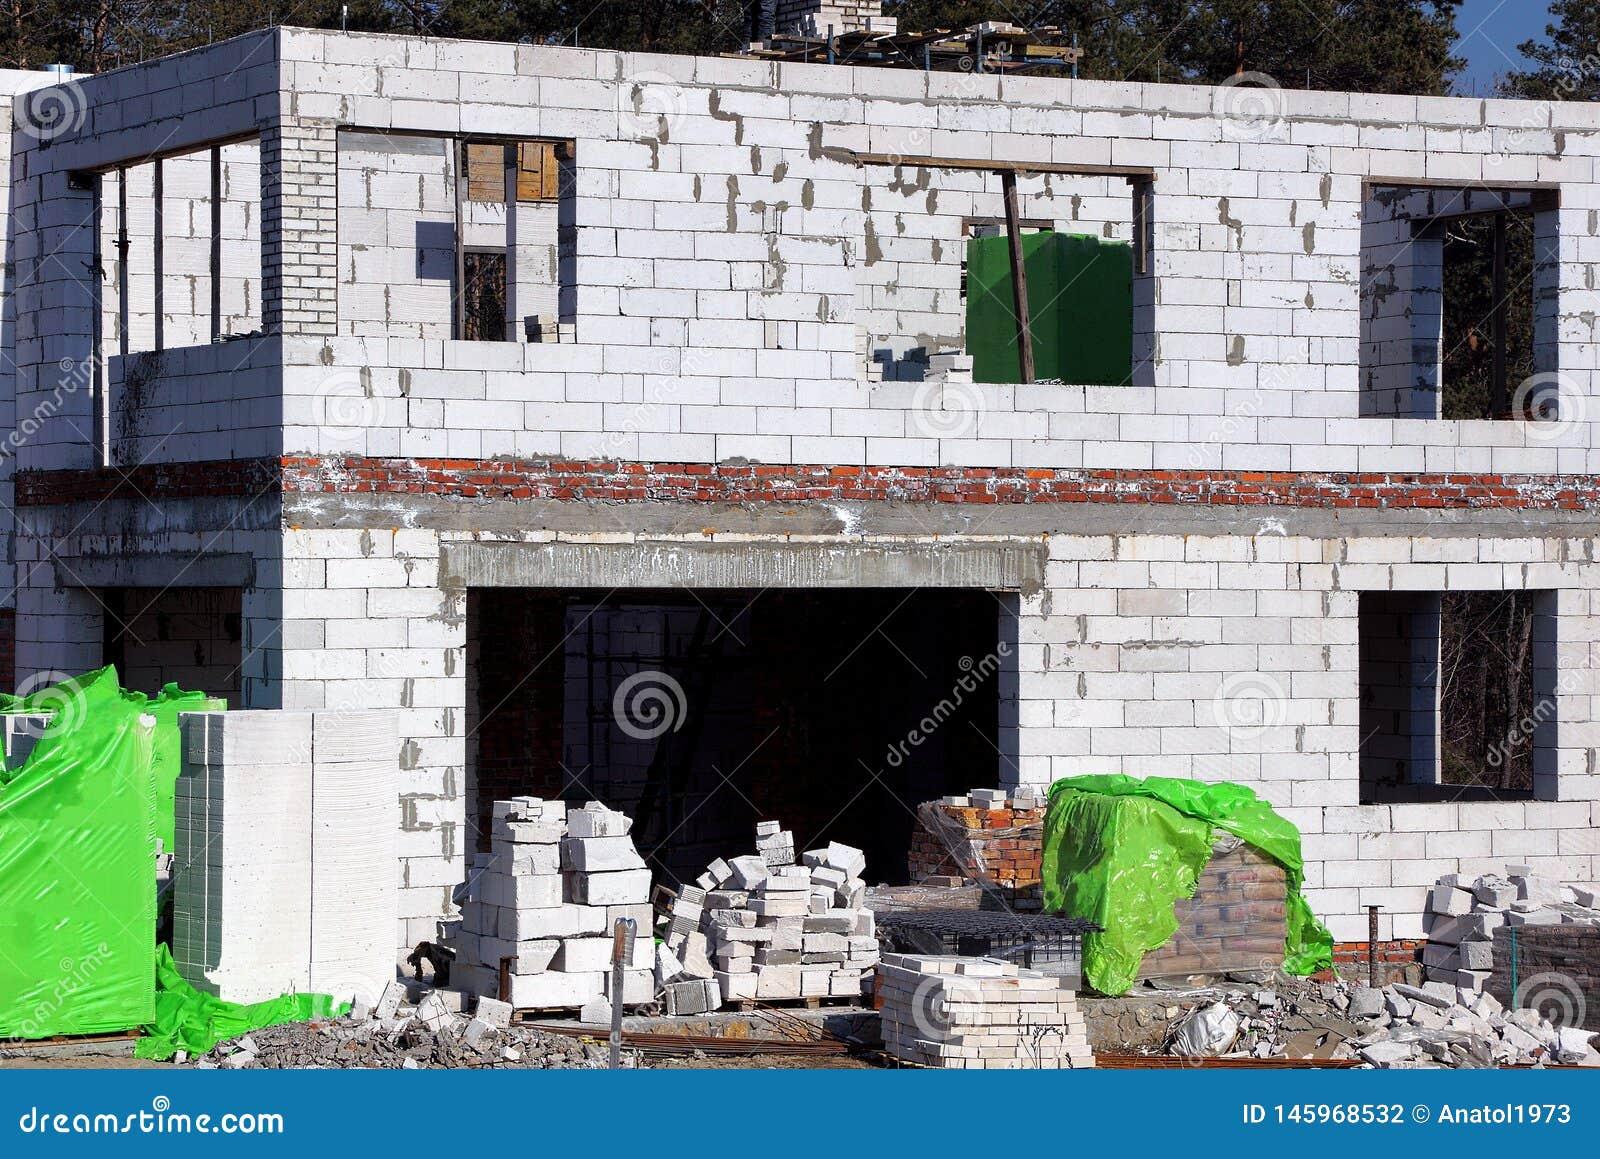 Ett stort vitt oavslutat tegelstenhus på byggandeplatsen